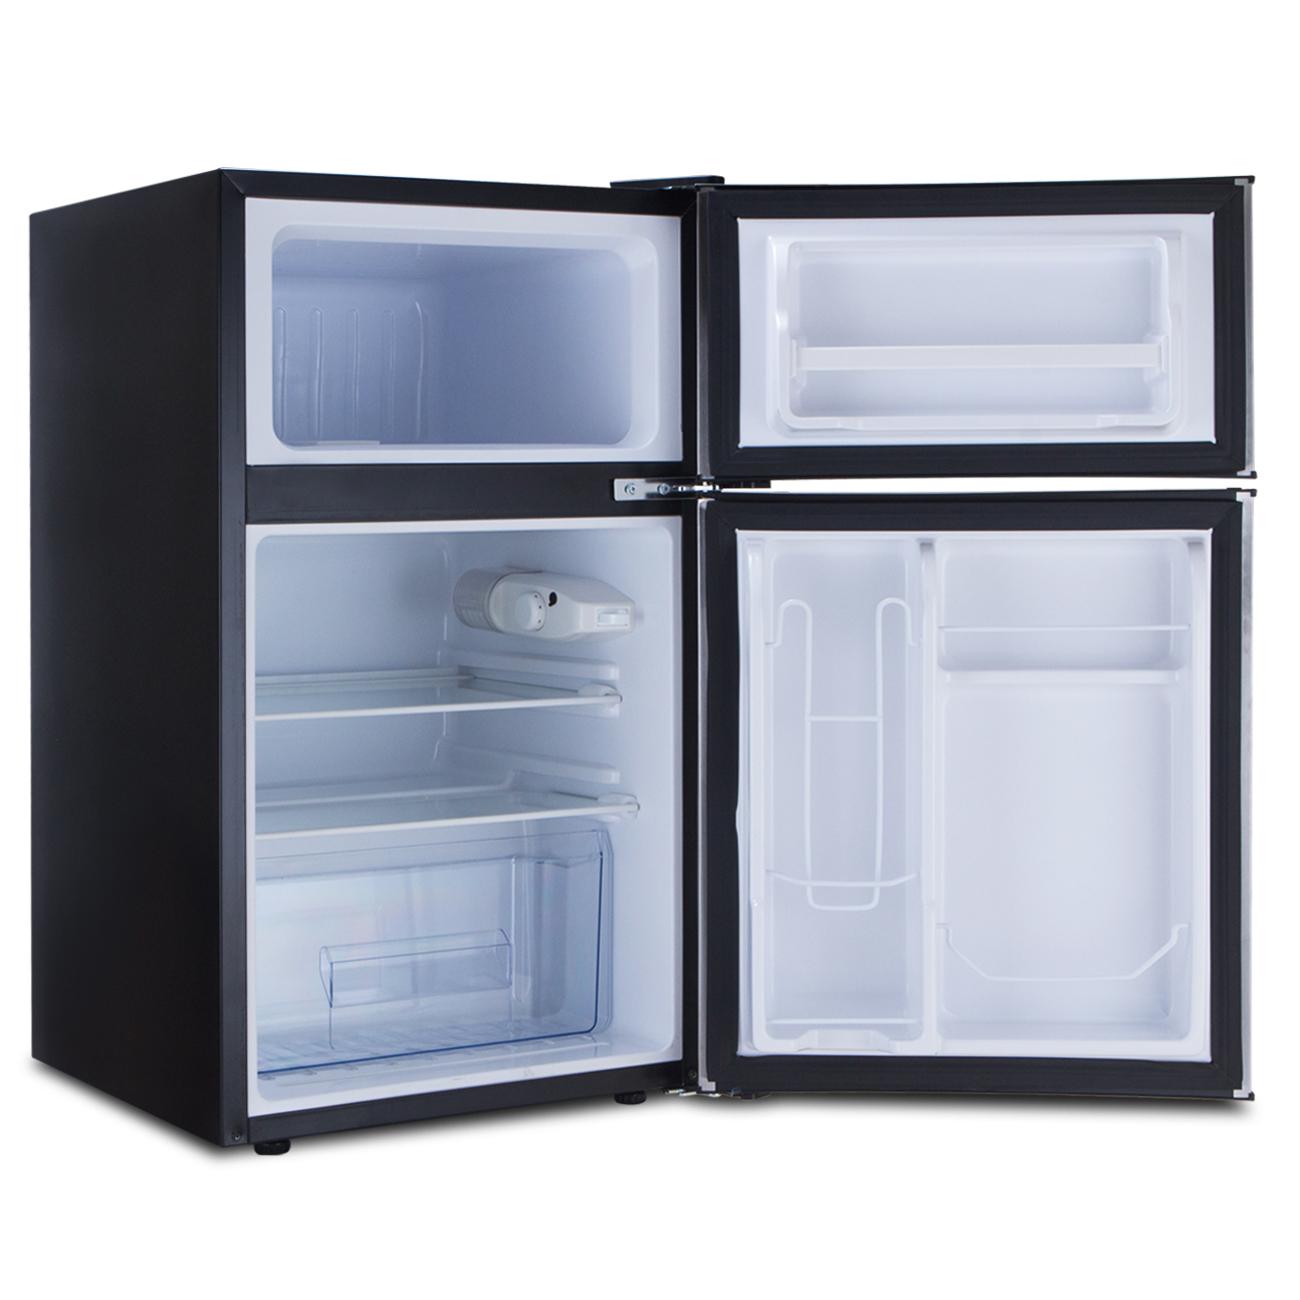 New Compact 3 2 Cu Ft Fridge Mini Dorm Office Refrigerator